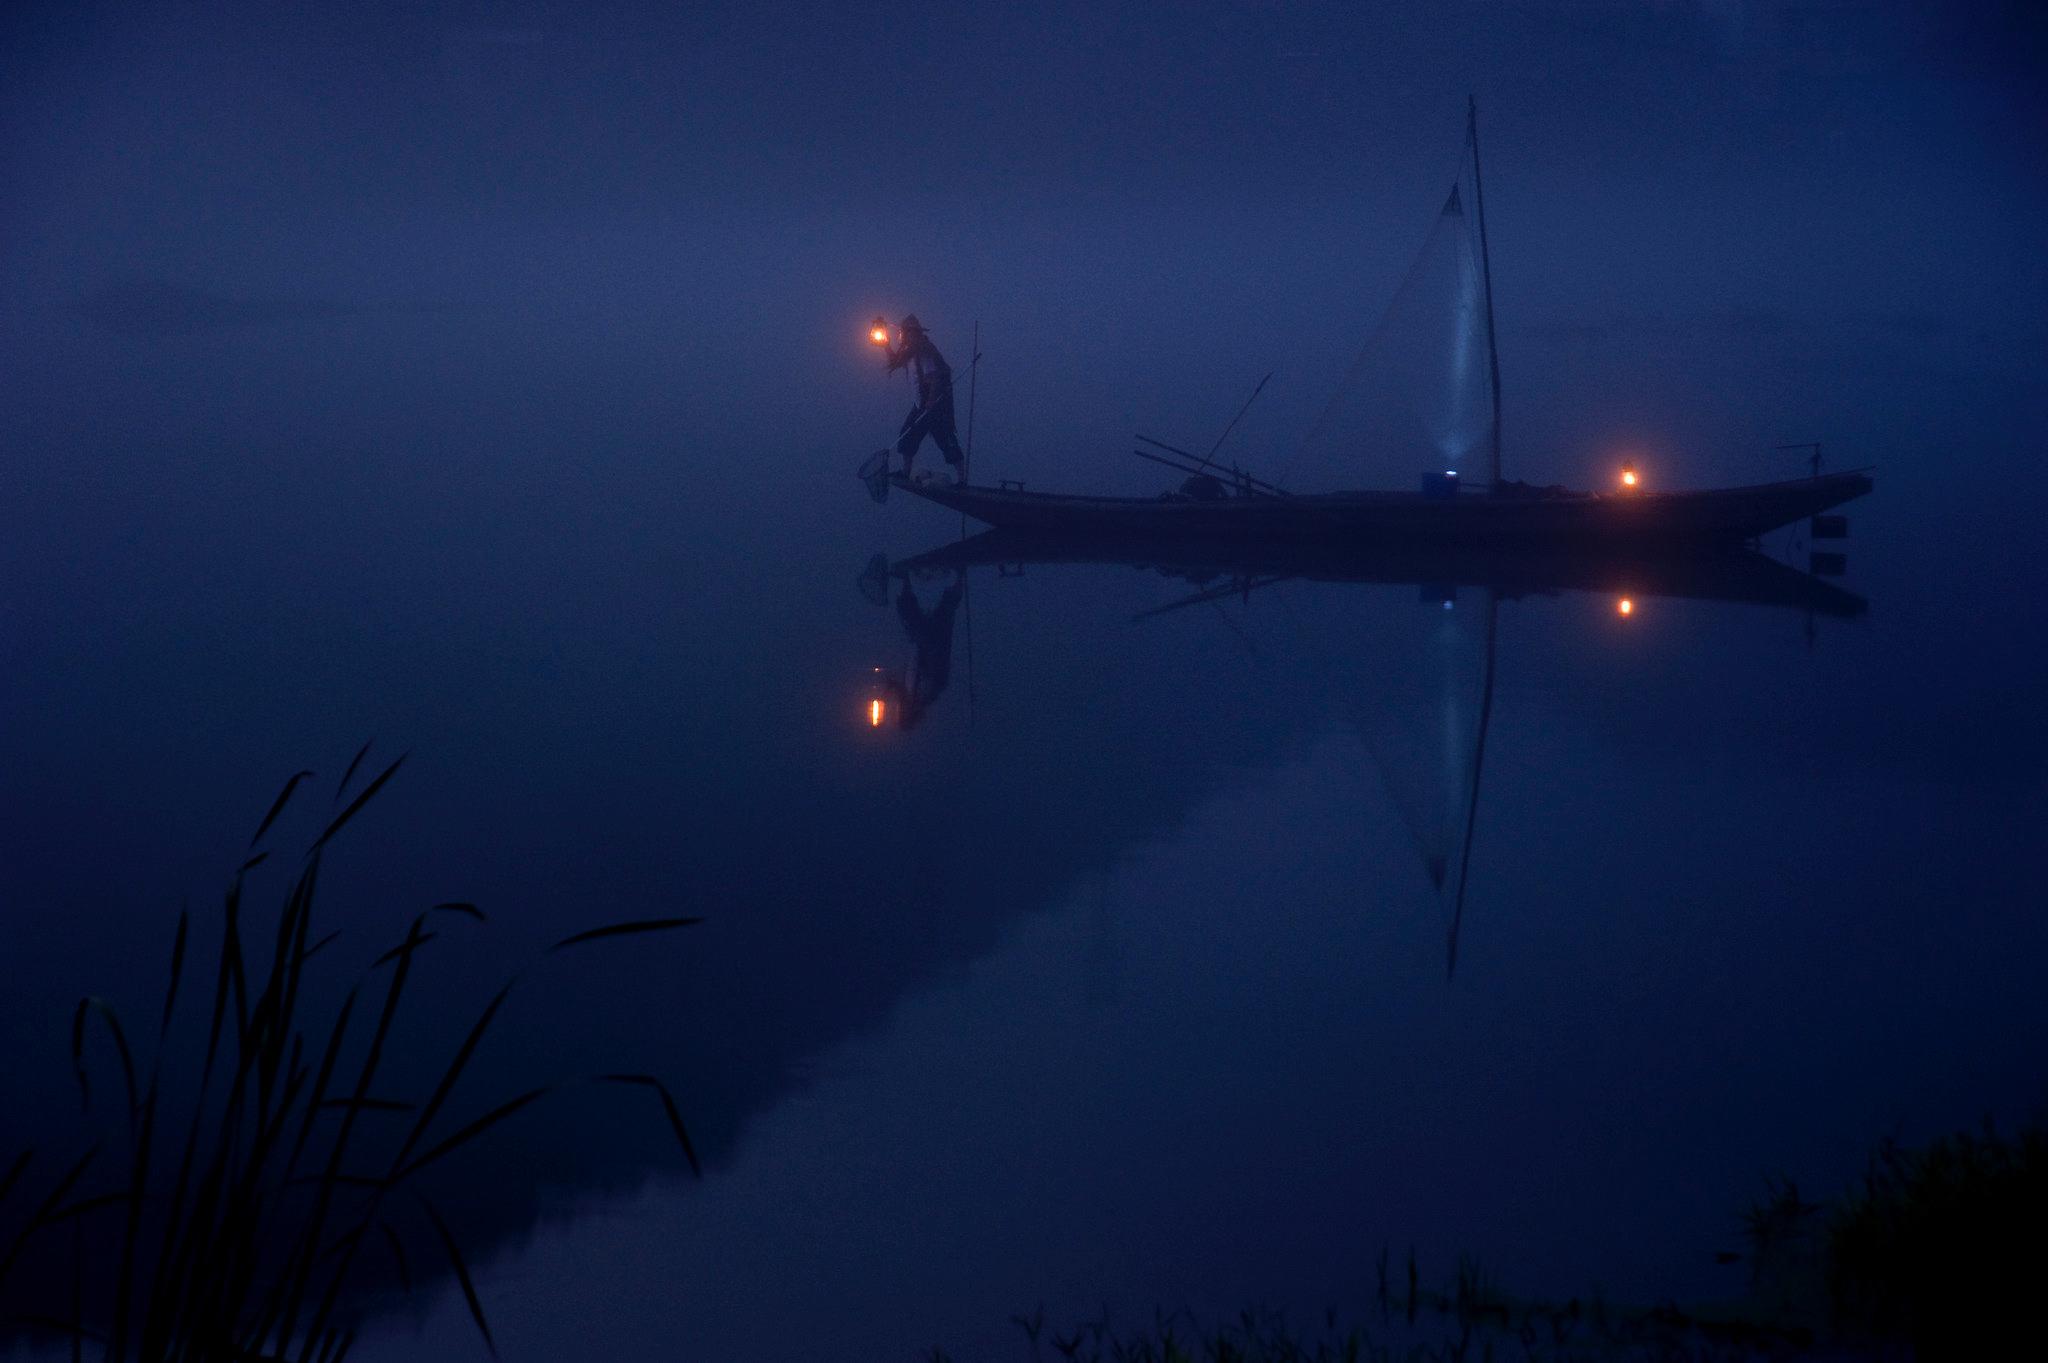 Image: Chen Yichun,  Unsplash